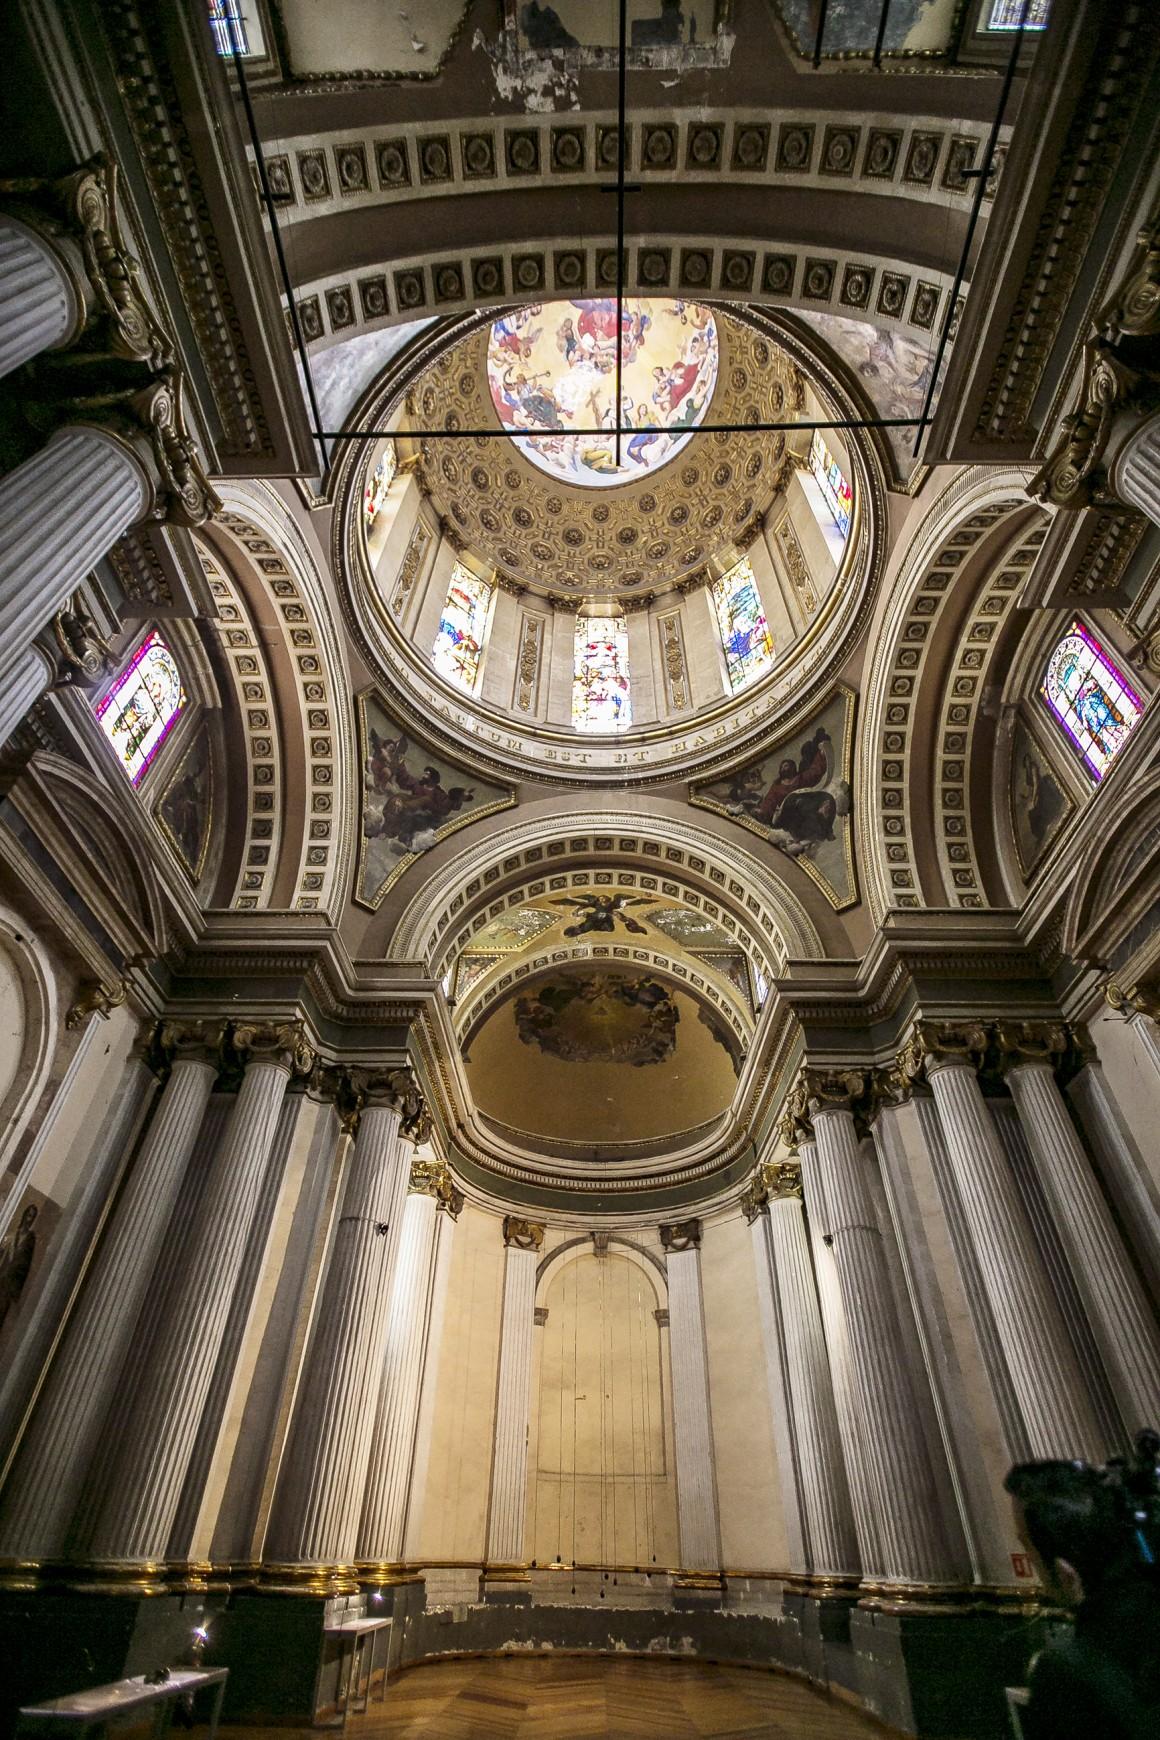 (3) cúpula diseñada por Lorenzo de la Hidalga (museo Ex Teresa Arte Actual) 2